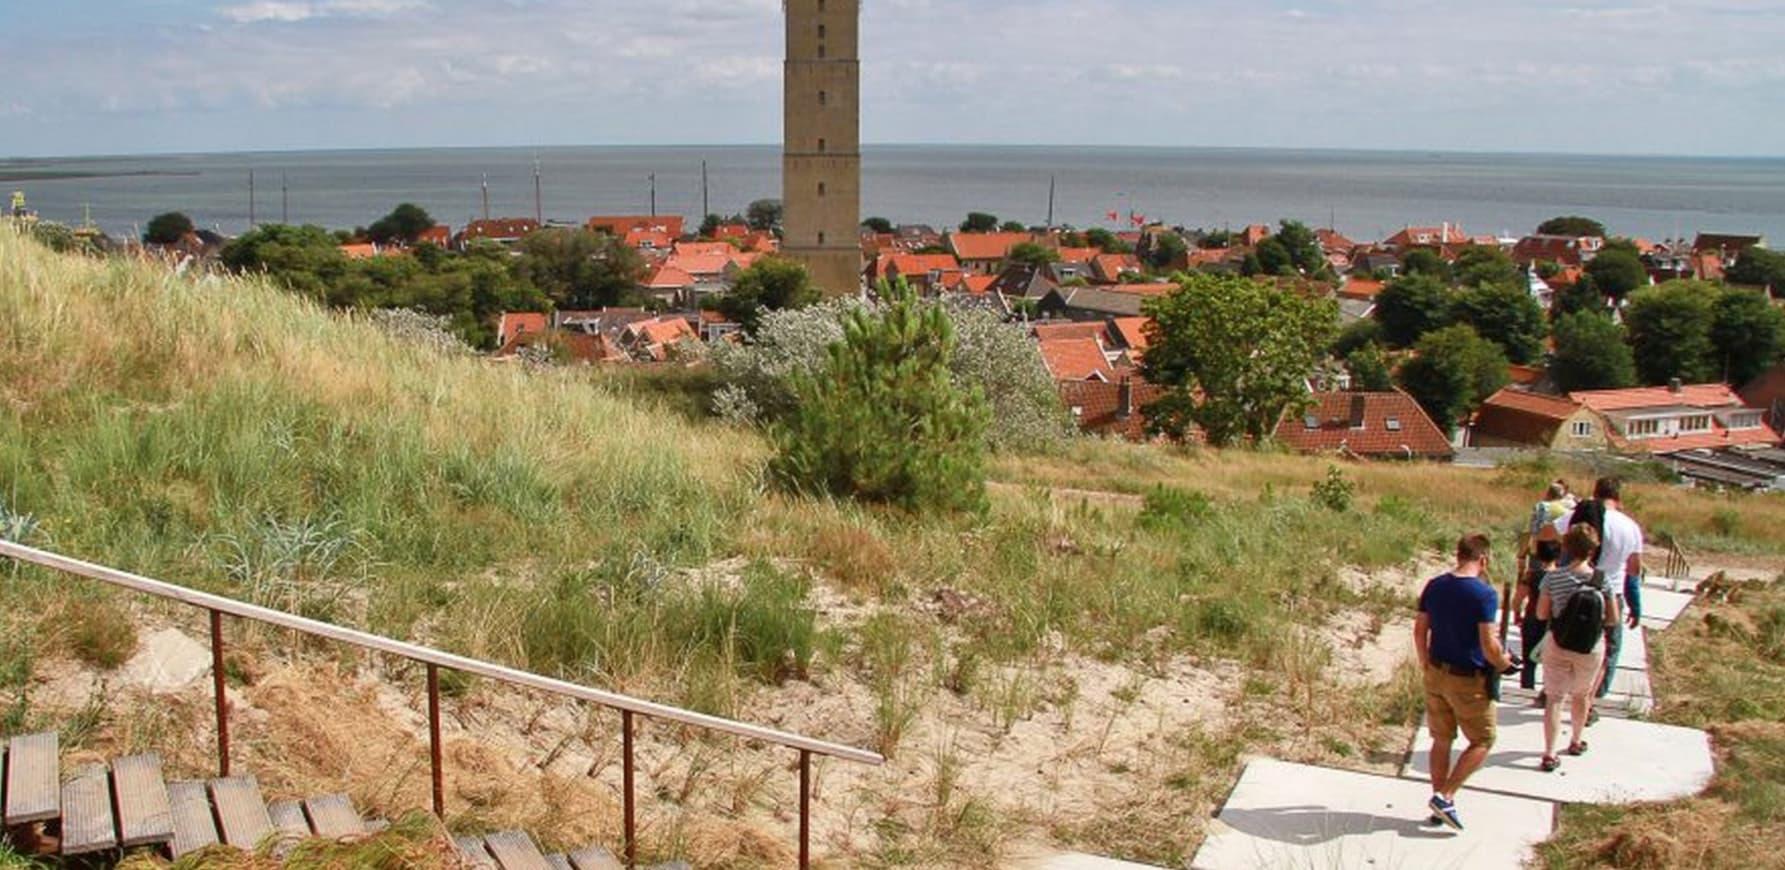 Eilandhoppen in Friesland